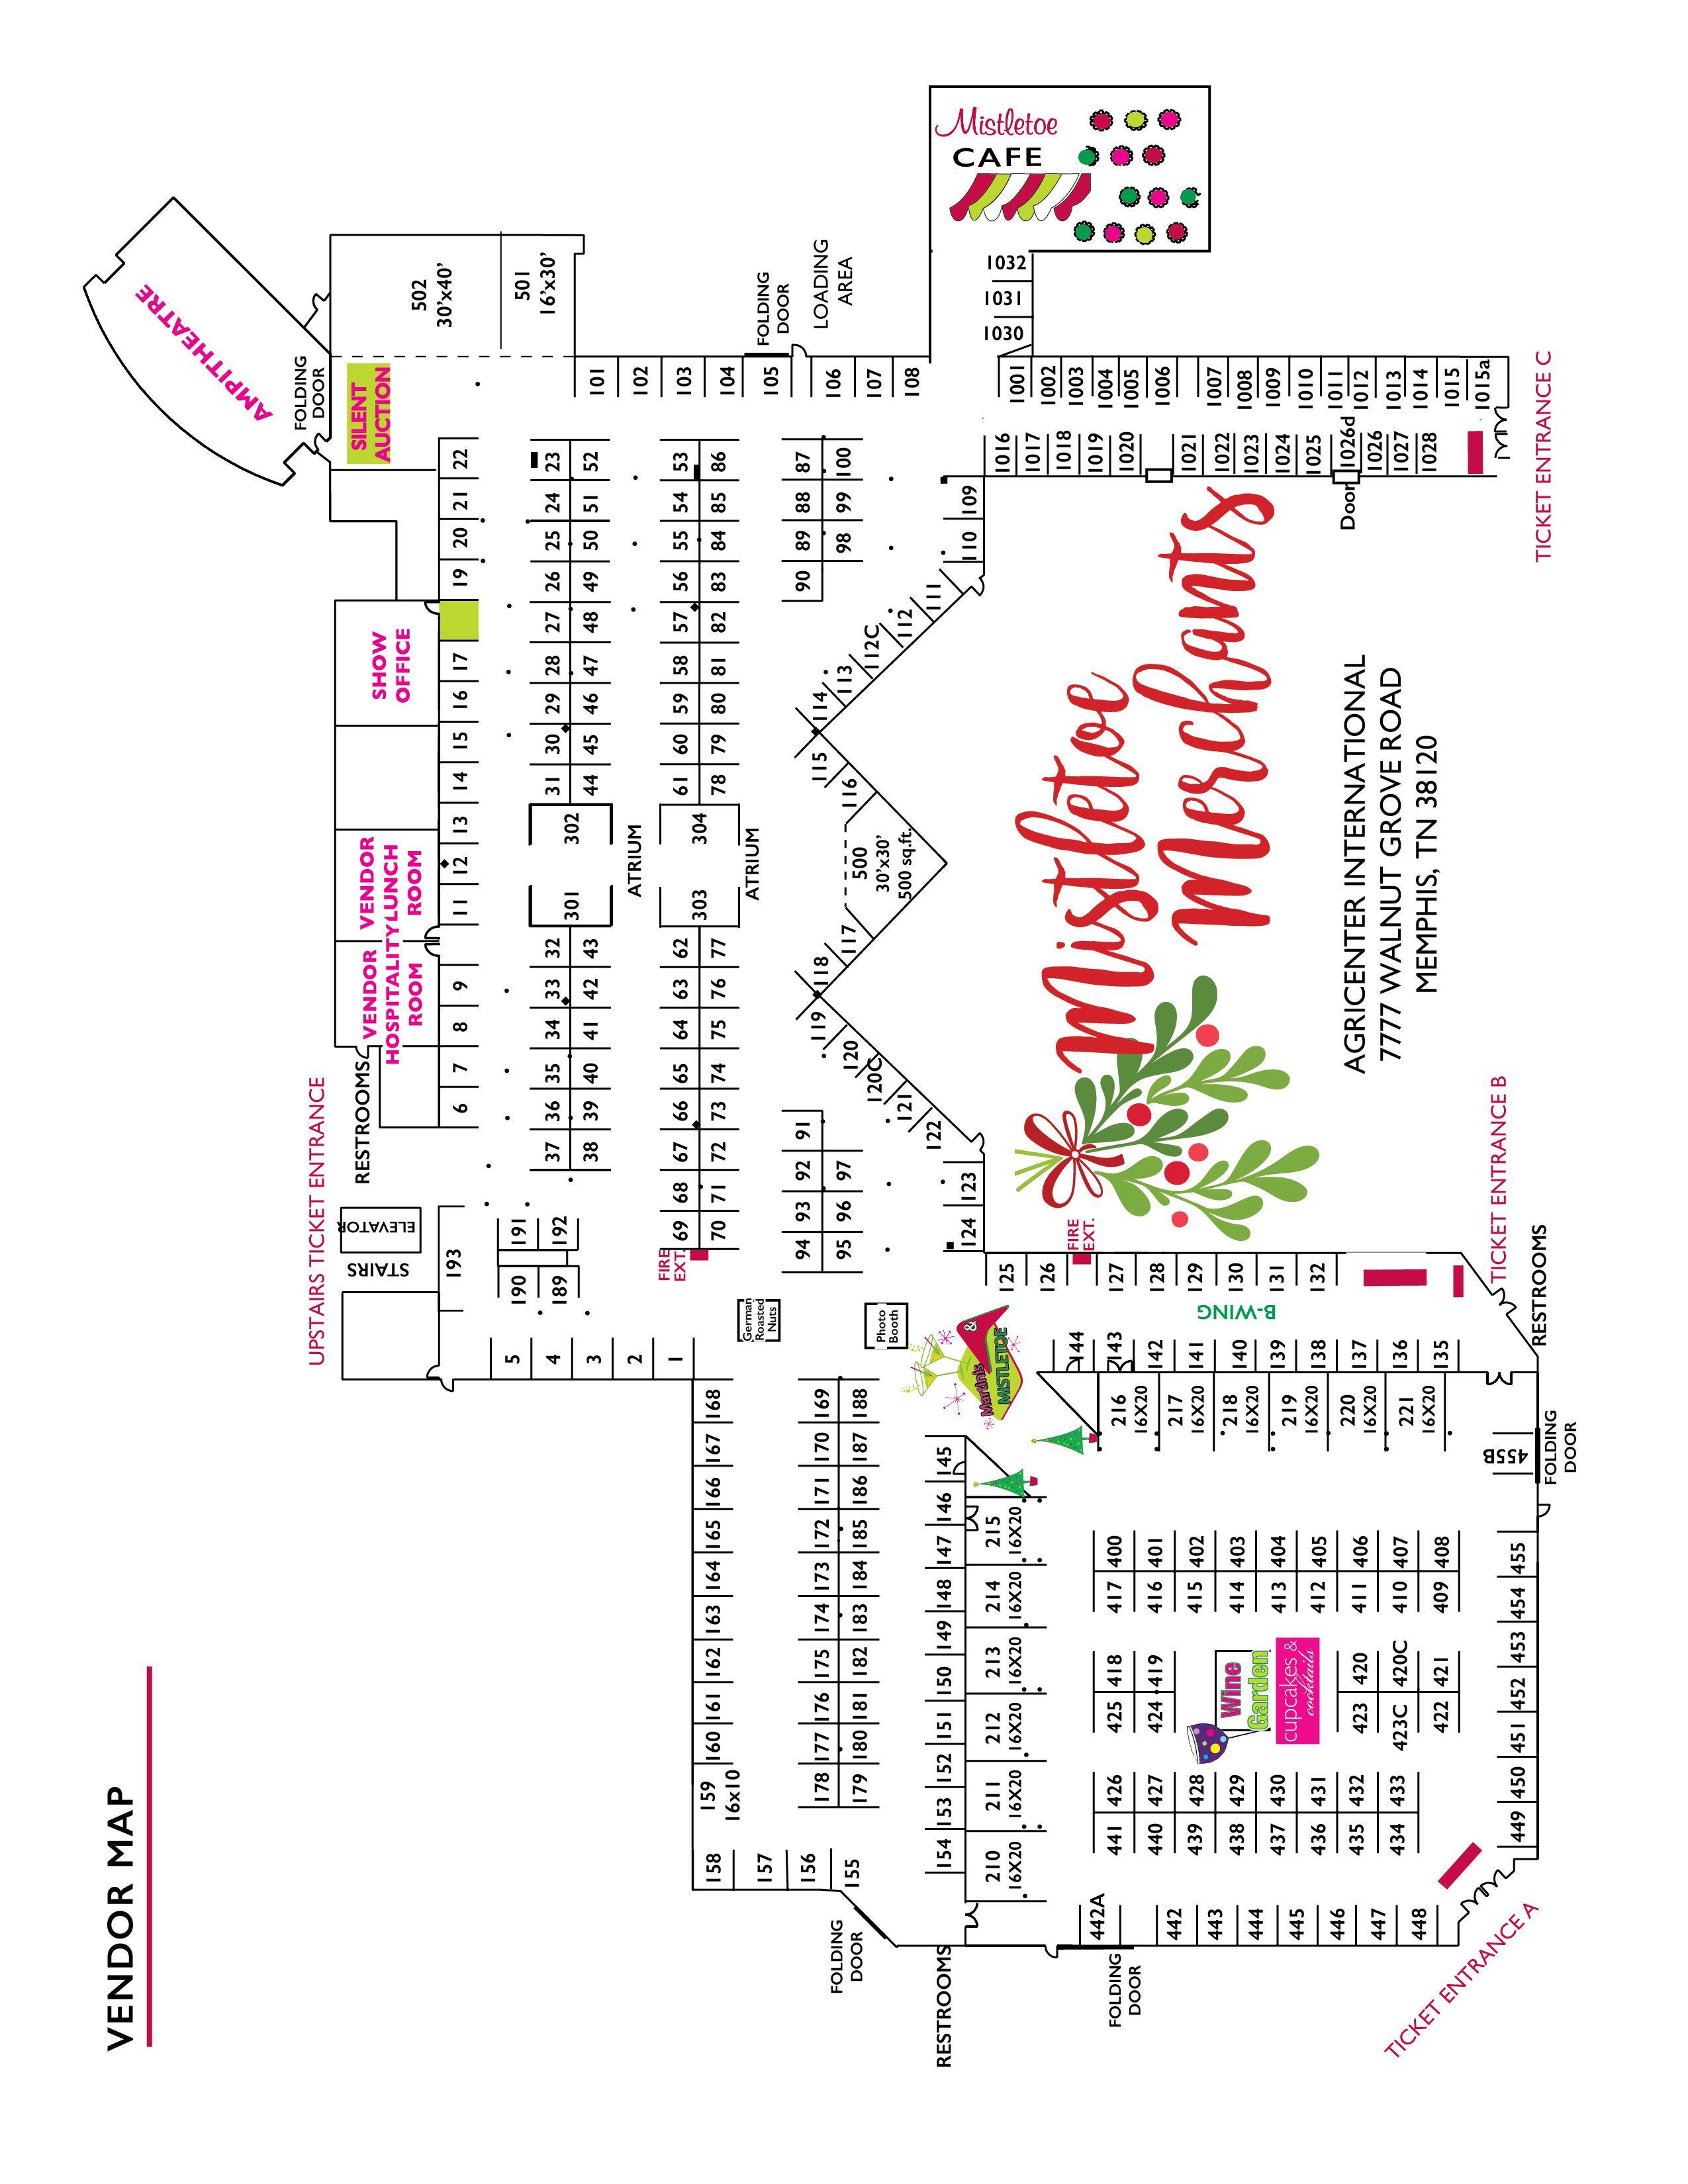 Mistletoe Memphis map